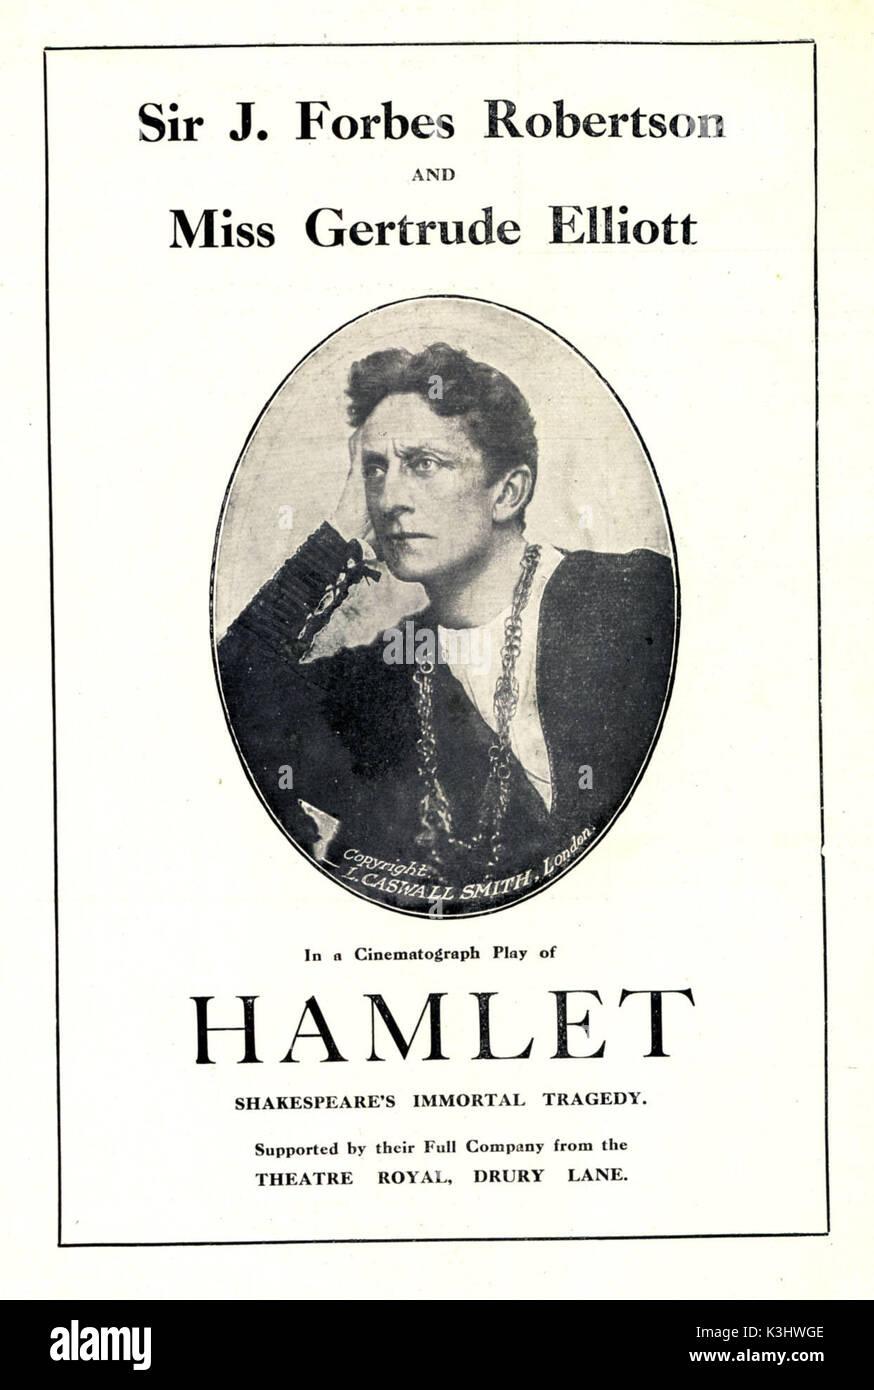 HAMLET SIR JOHNSTON FORBES ROBERTSON     Date: 1913 - Stock Image